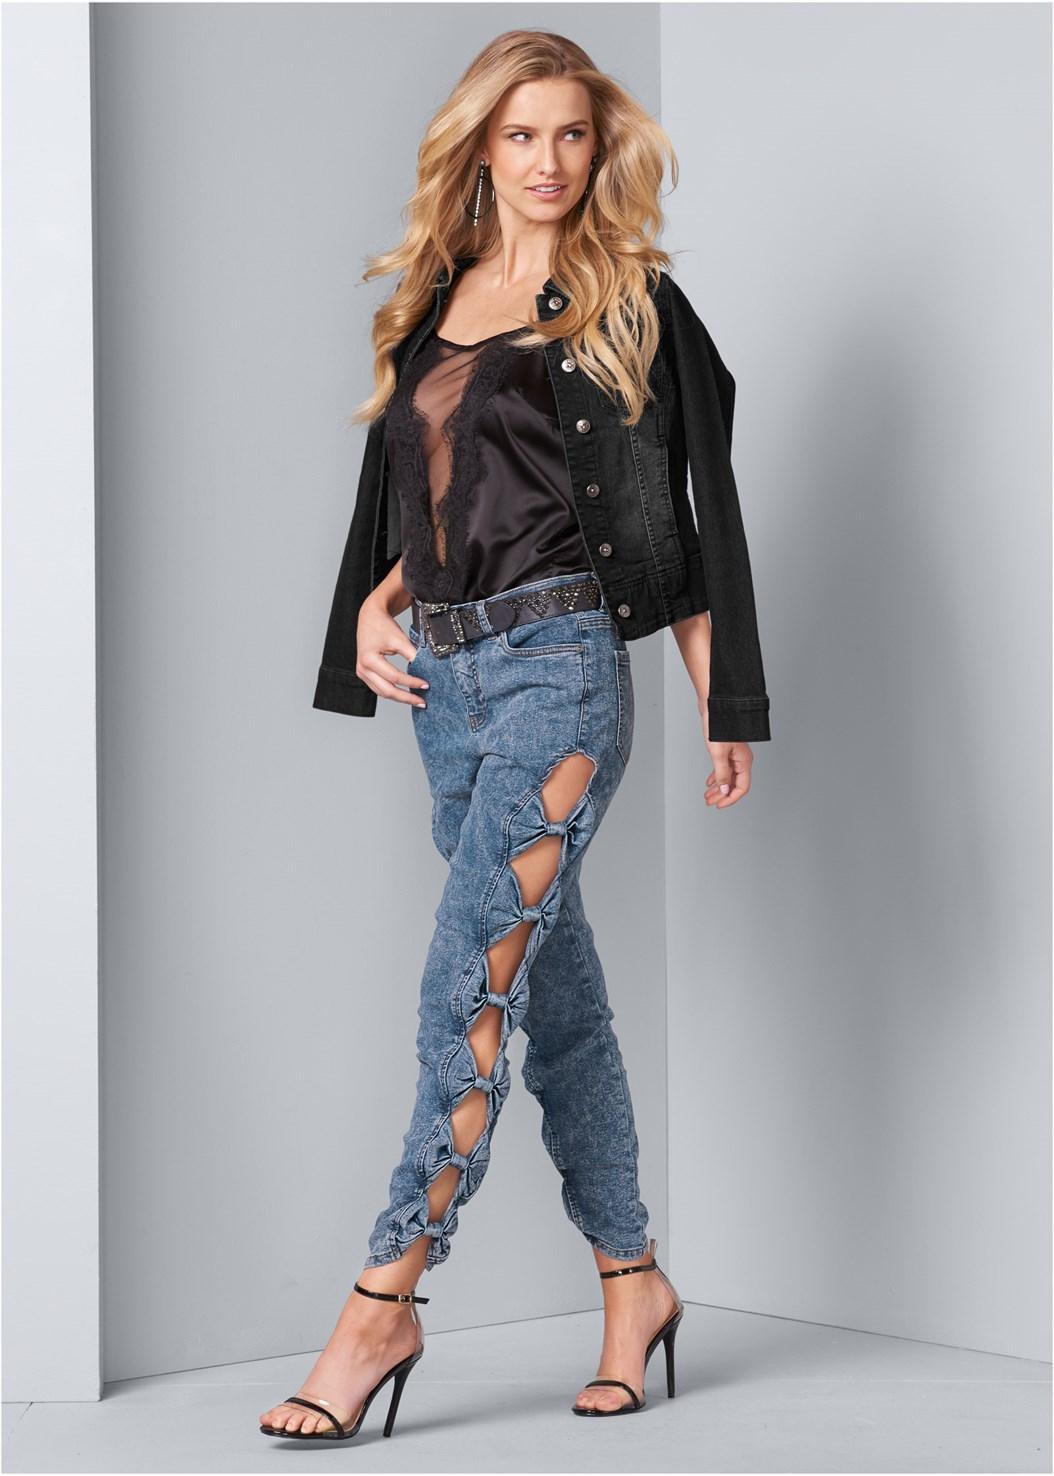 Acid Wash Jeans,Lace Detail Tank,Jean Jacket,Faux Leather Lace Up Jacket,Quilted Belt Bag,Lucite Detail Heels,Bow Detail Print Heels